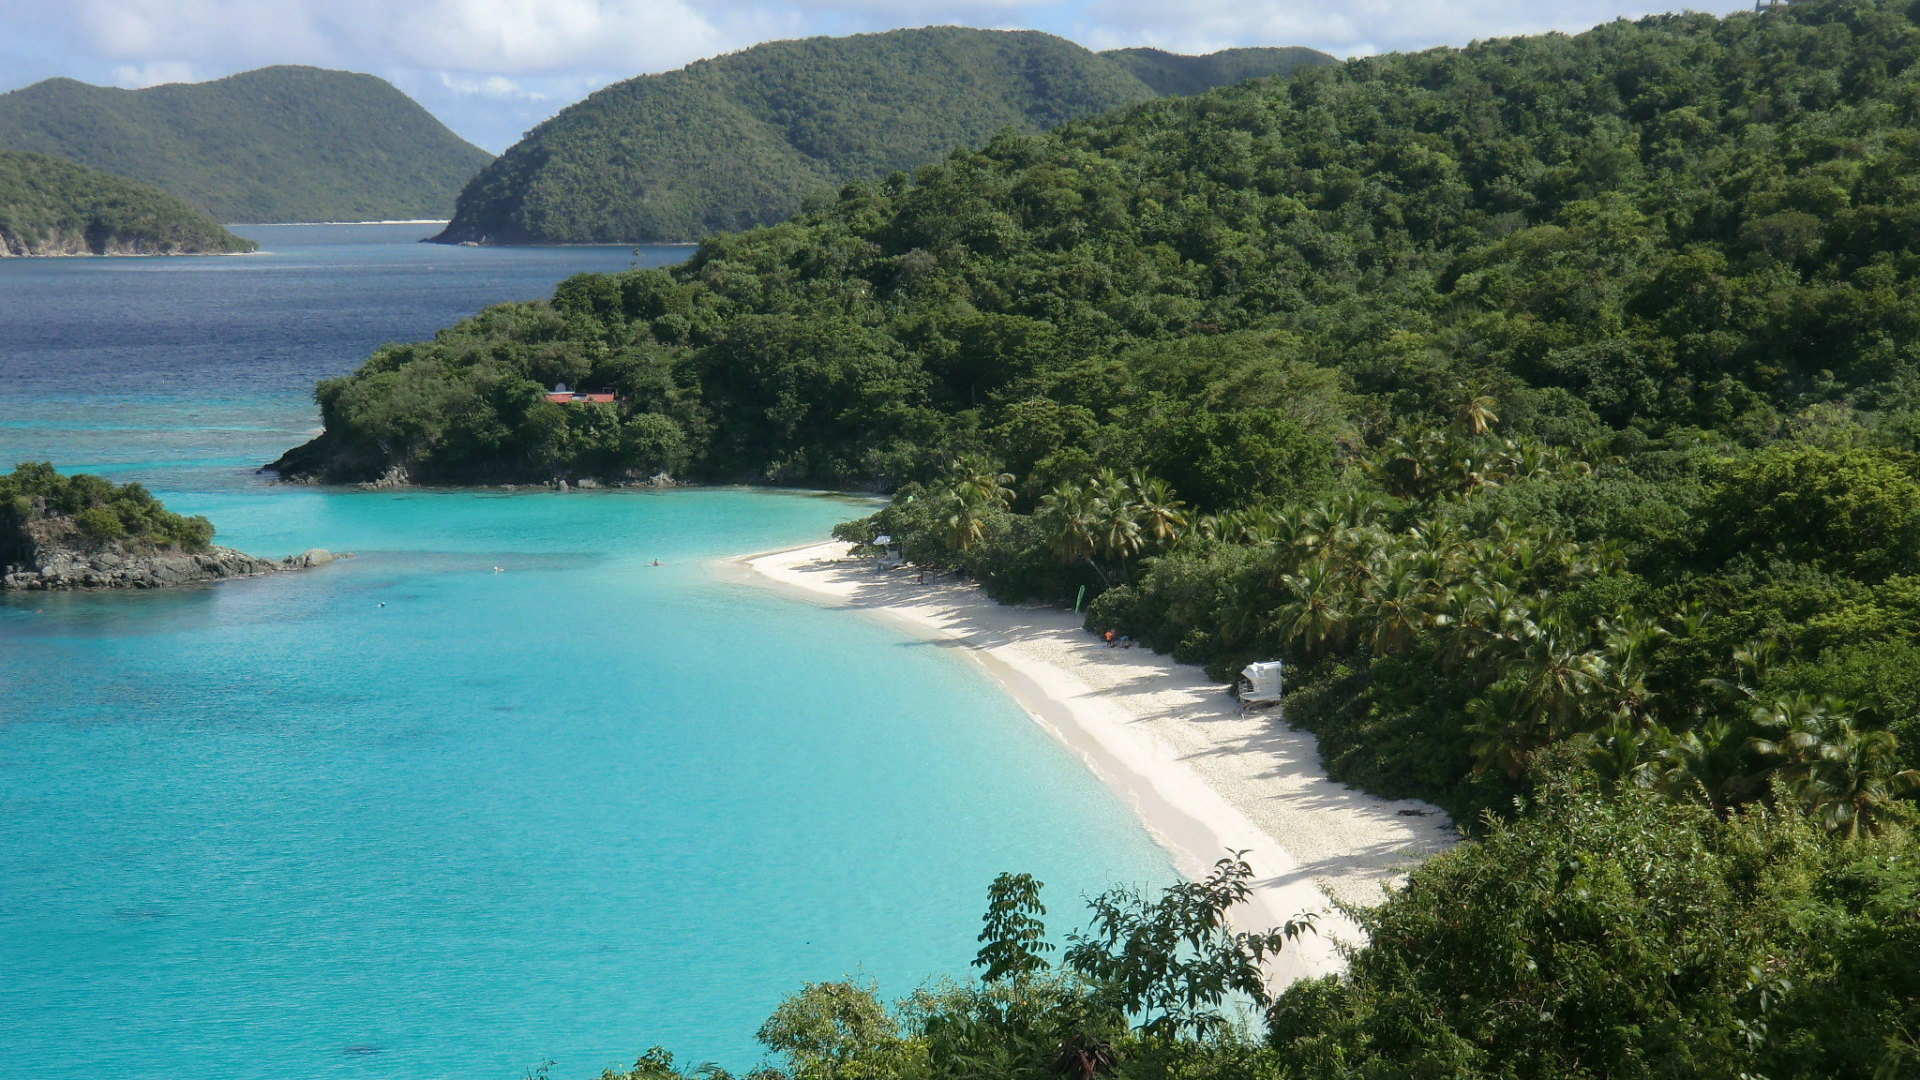 Annexation of U.S. Virgin Islands